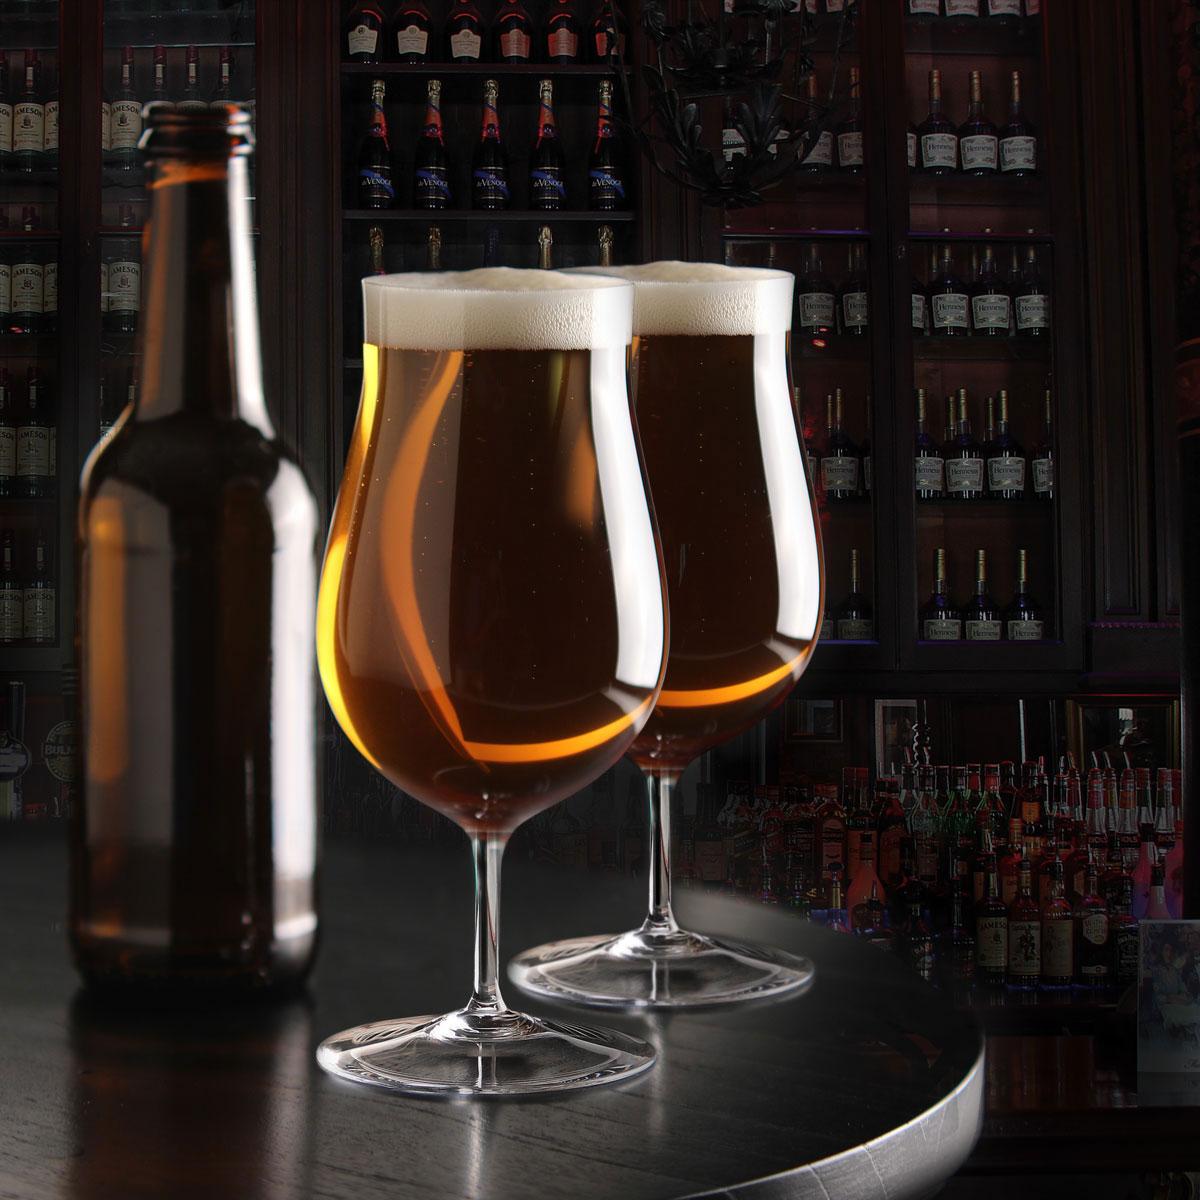 Cashs Ireland, Grand Cru Handmade Craft Beer Glasses, Pair